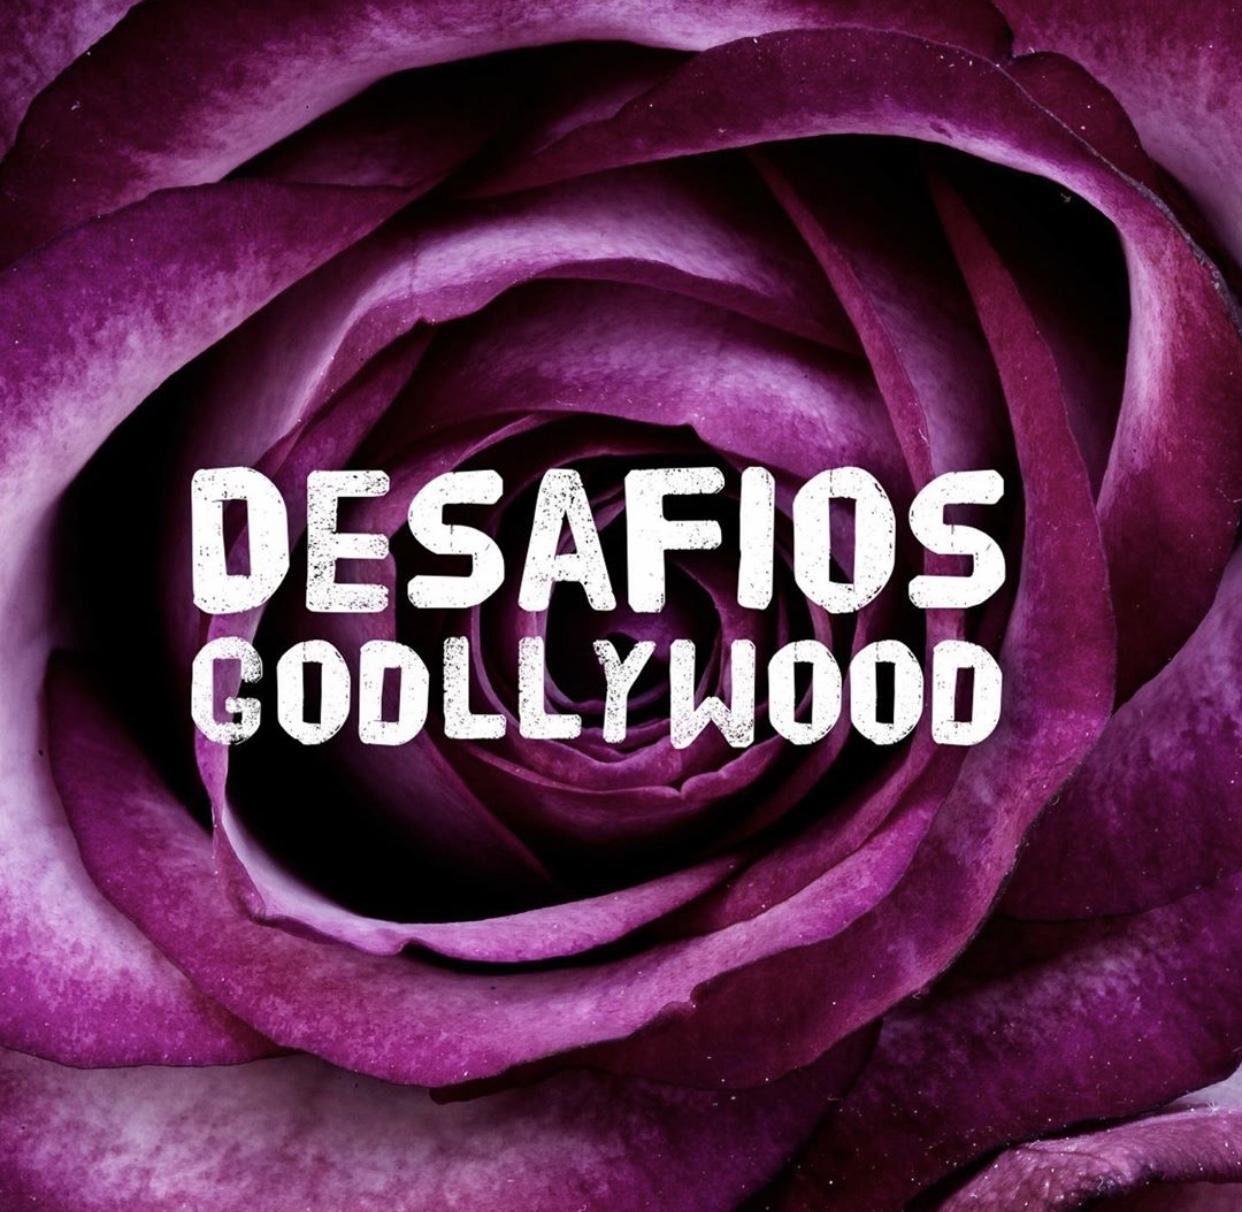 Novos Desafios Godllywood